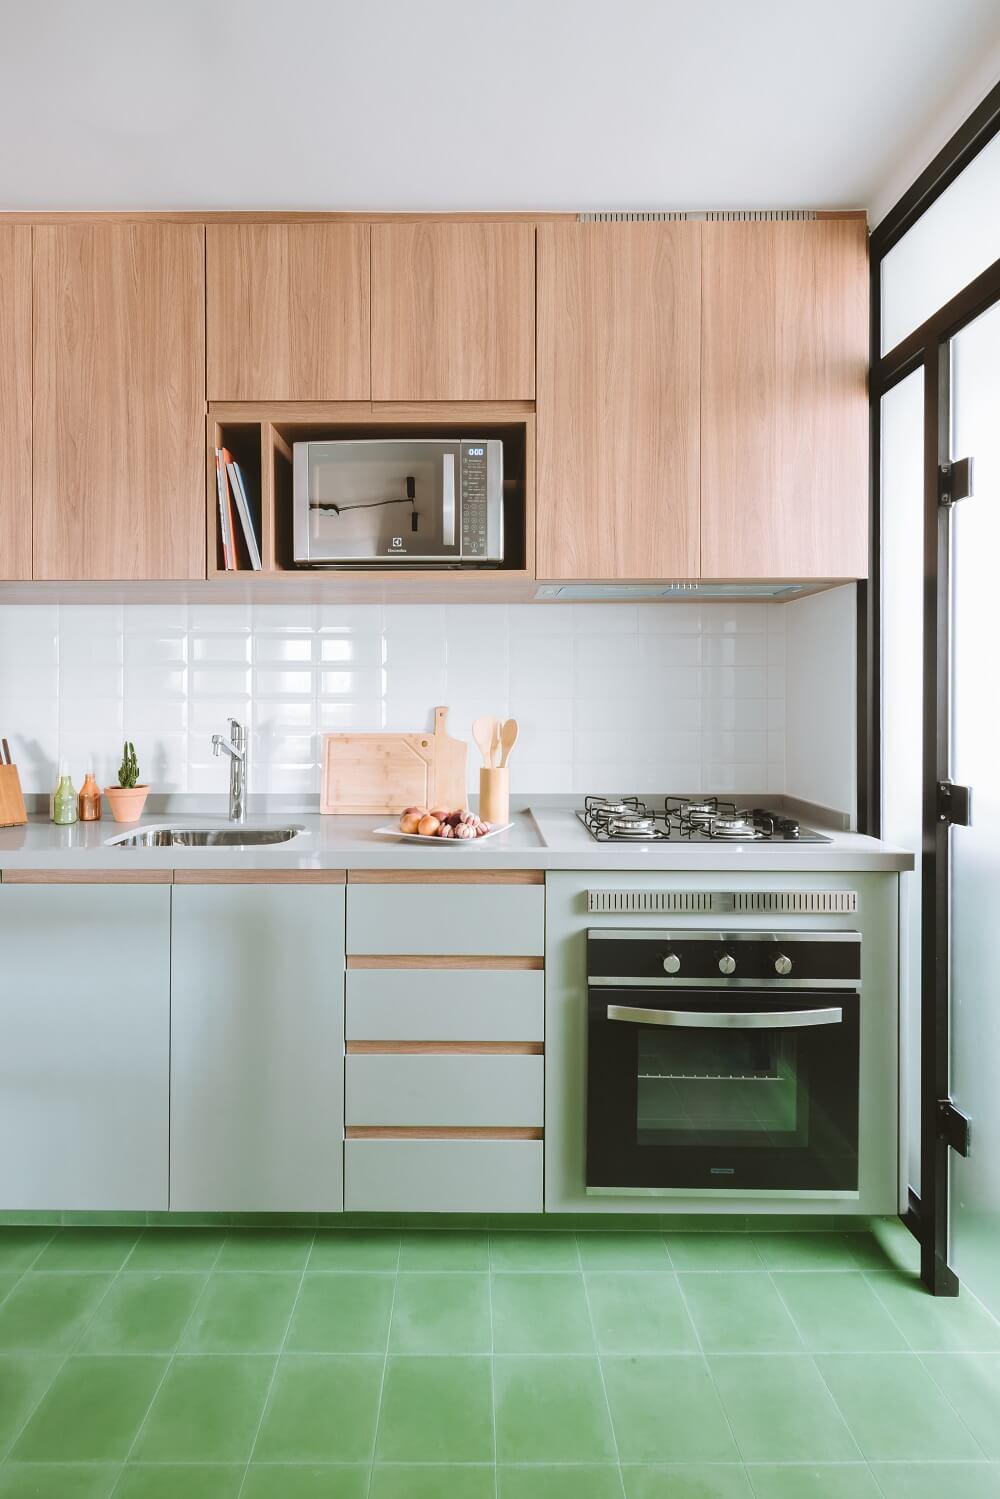 A cozinha foi repaginada e recebeu ladrilho hidráulico na cor verde. Foto: Juliana Deeke